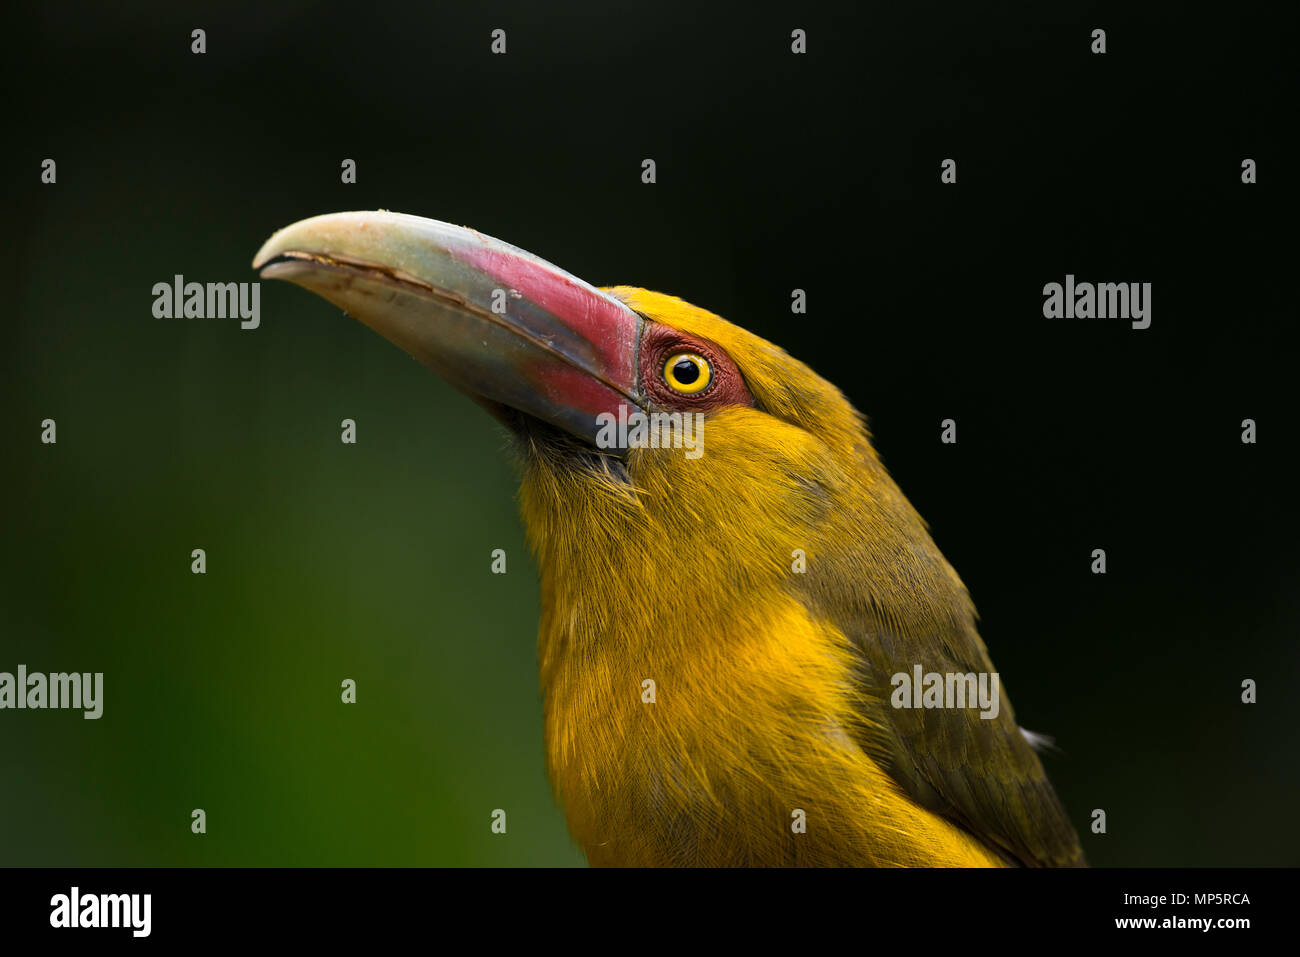 Saffron Toucanet (Pteroglossus bailloni) closeu-up, from the Atlantic Rainforests of SE Brazil - Stock Image